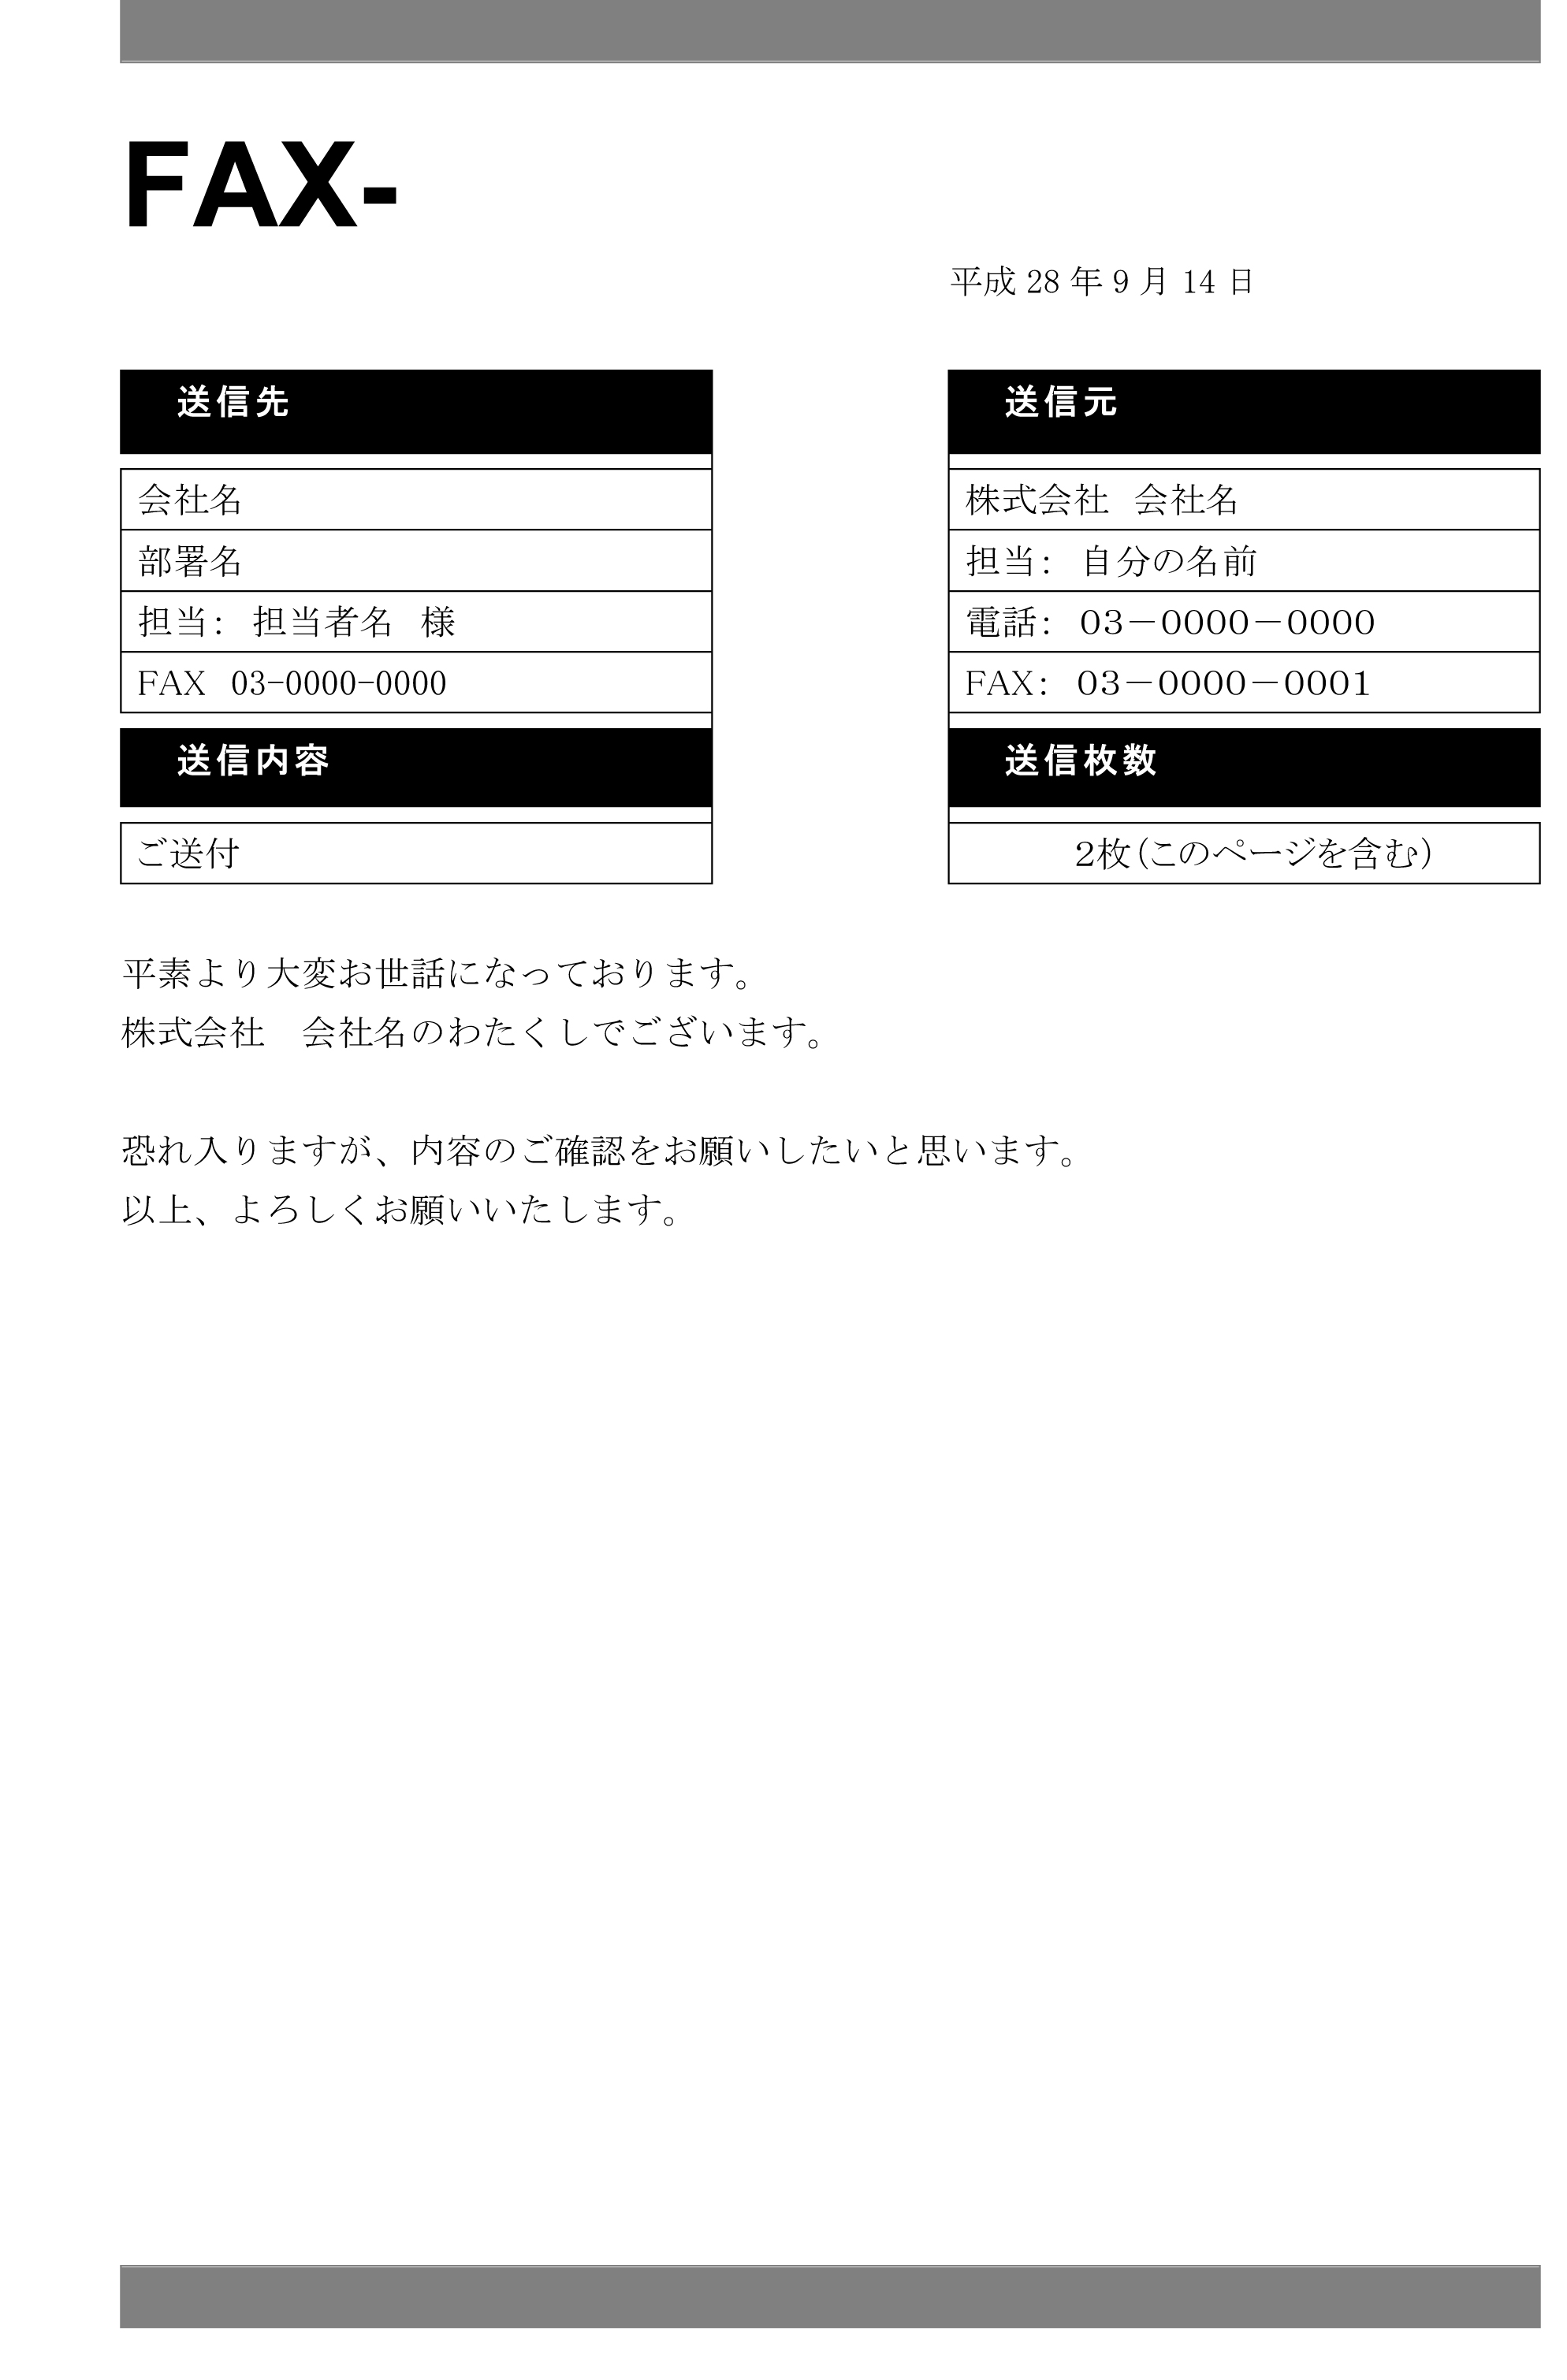 fax送付状_5